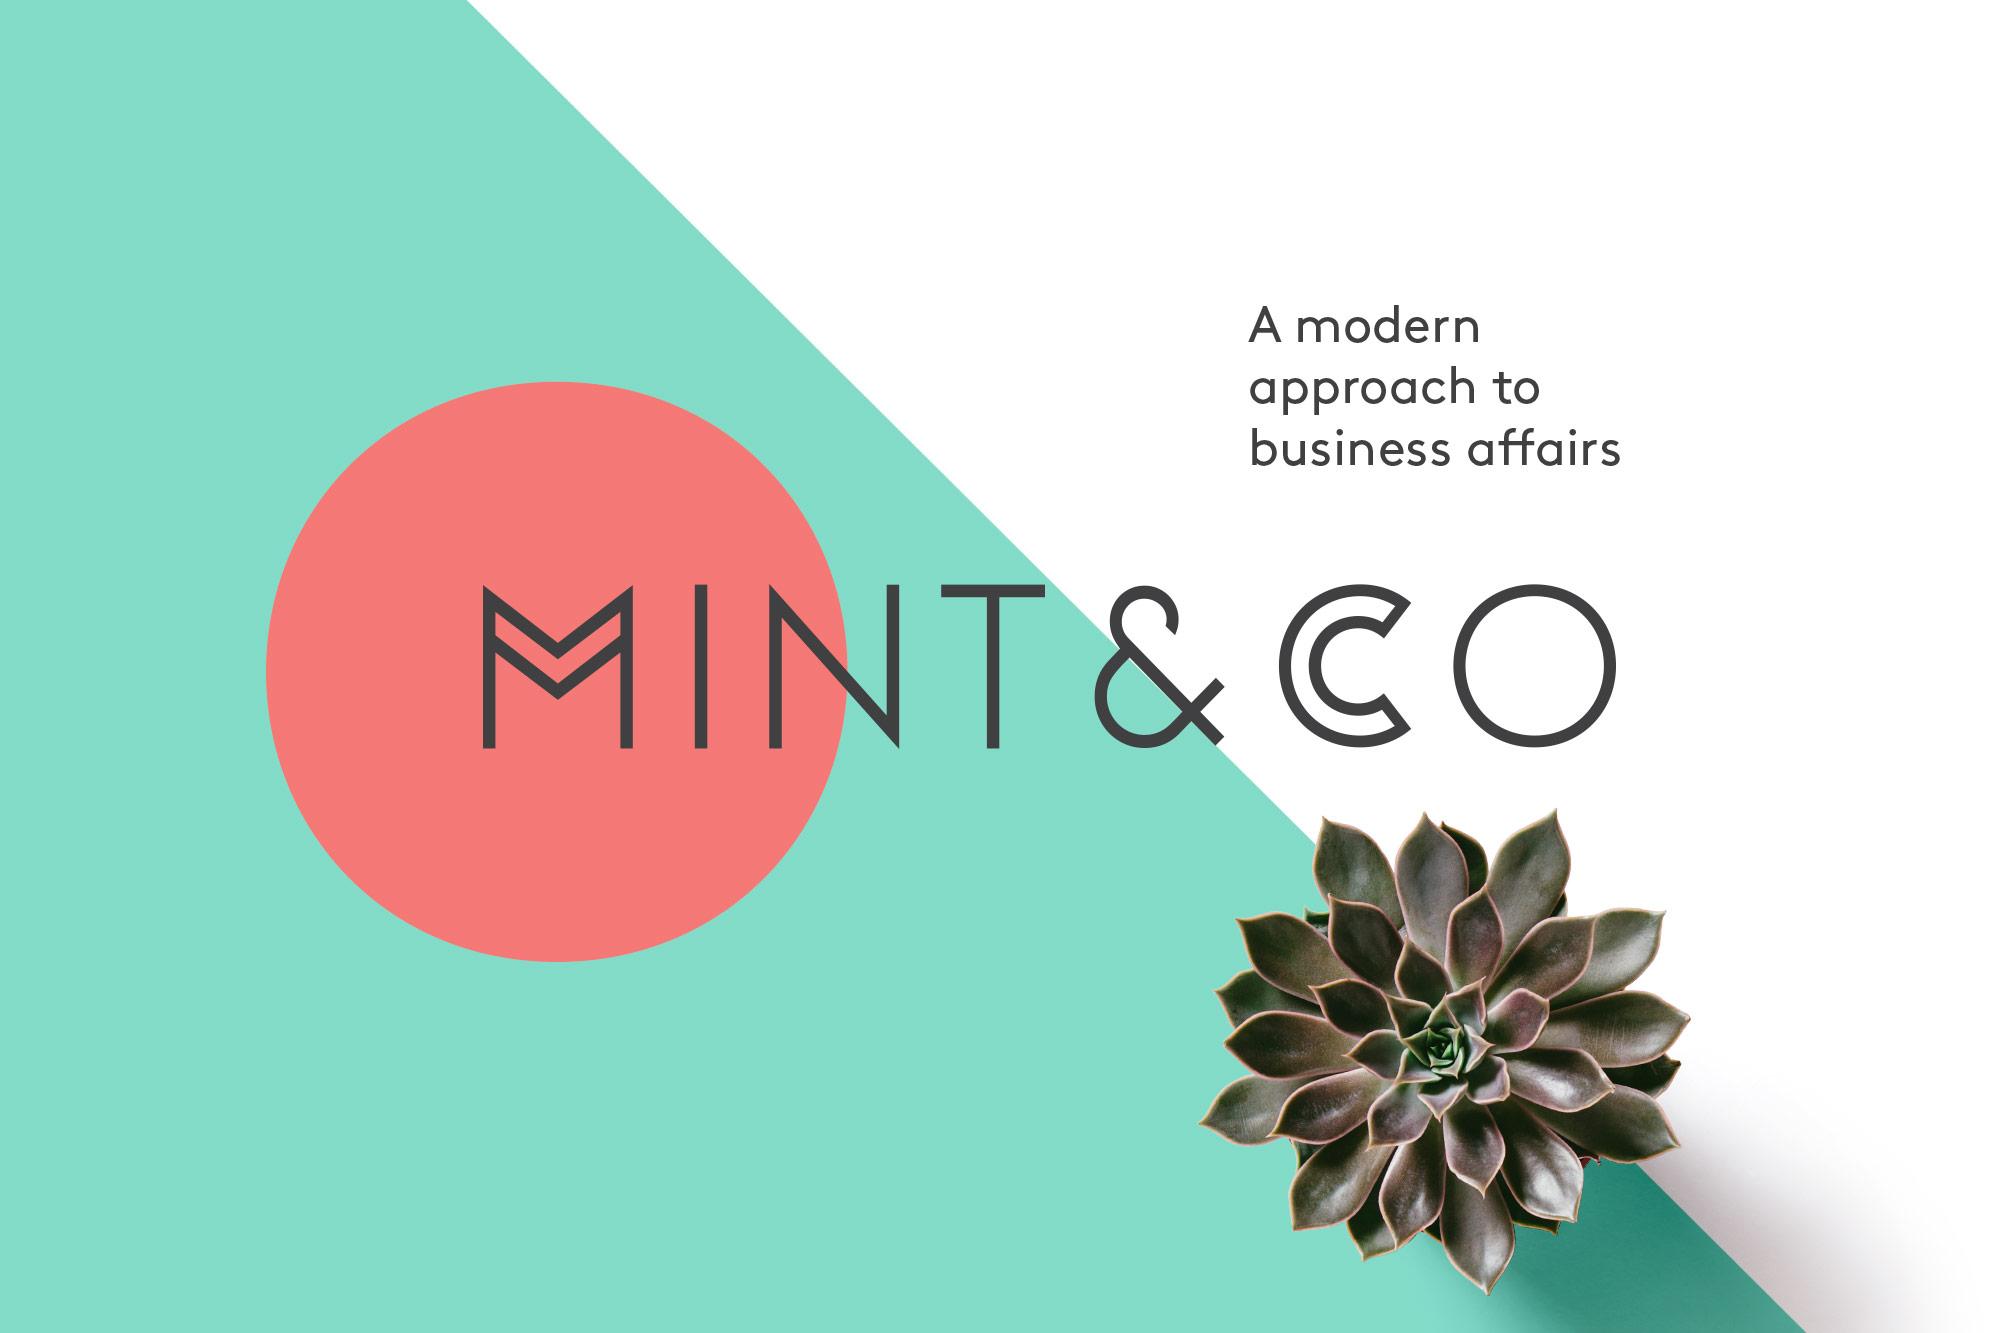 gareth-paul-jones-studio-design-mintco-branding-cs-02b